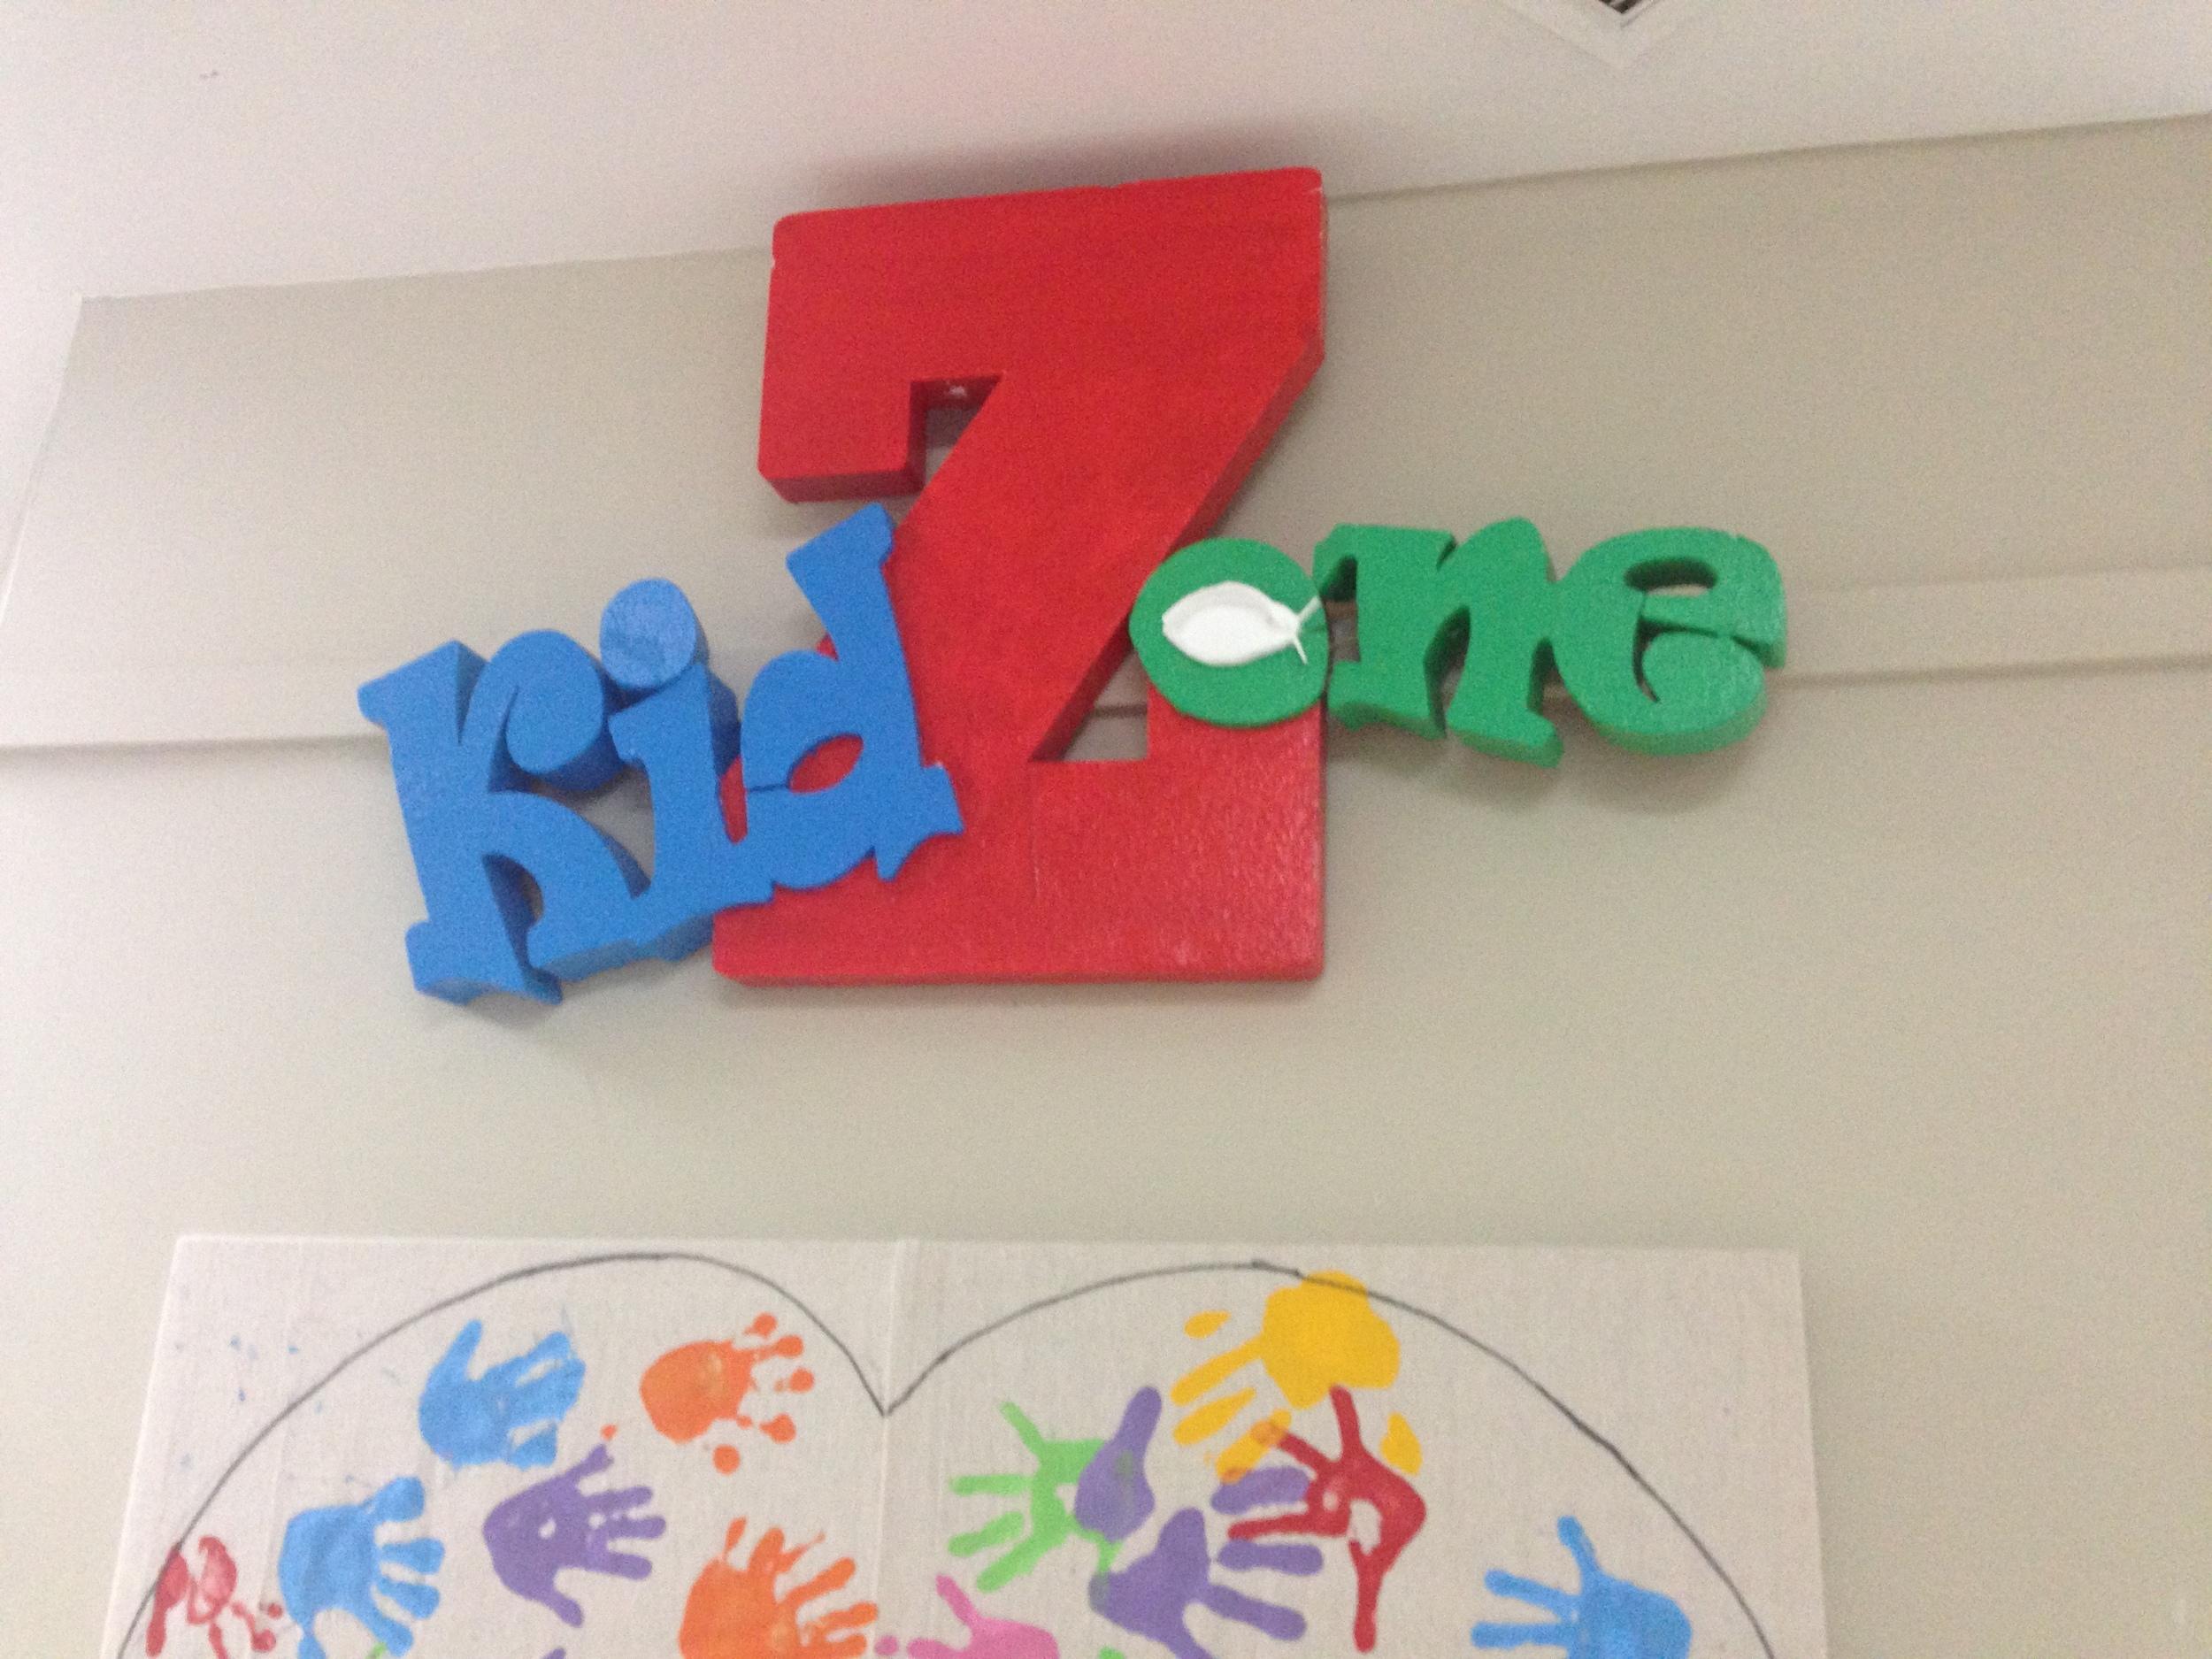 Entering the KidZone